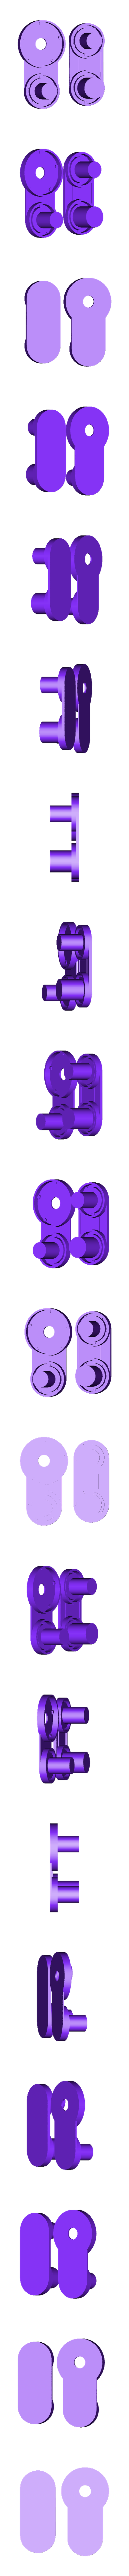 testing_plates.stl Download free STL file Coffee Grinder • 3D printer template, Wachet